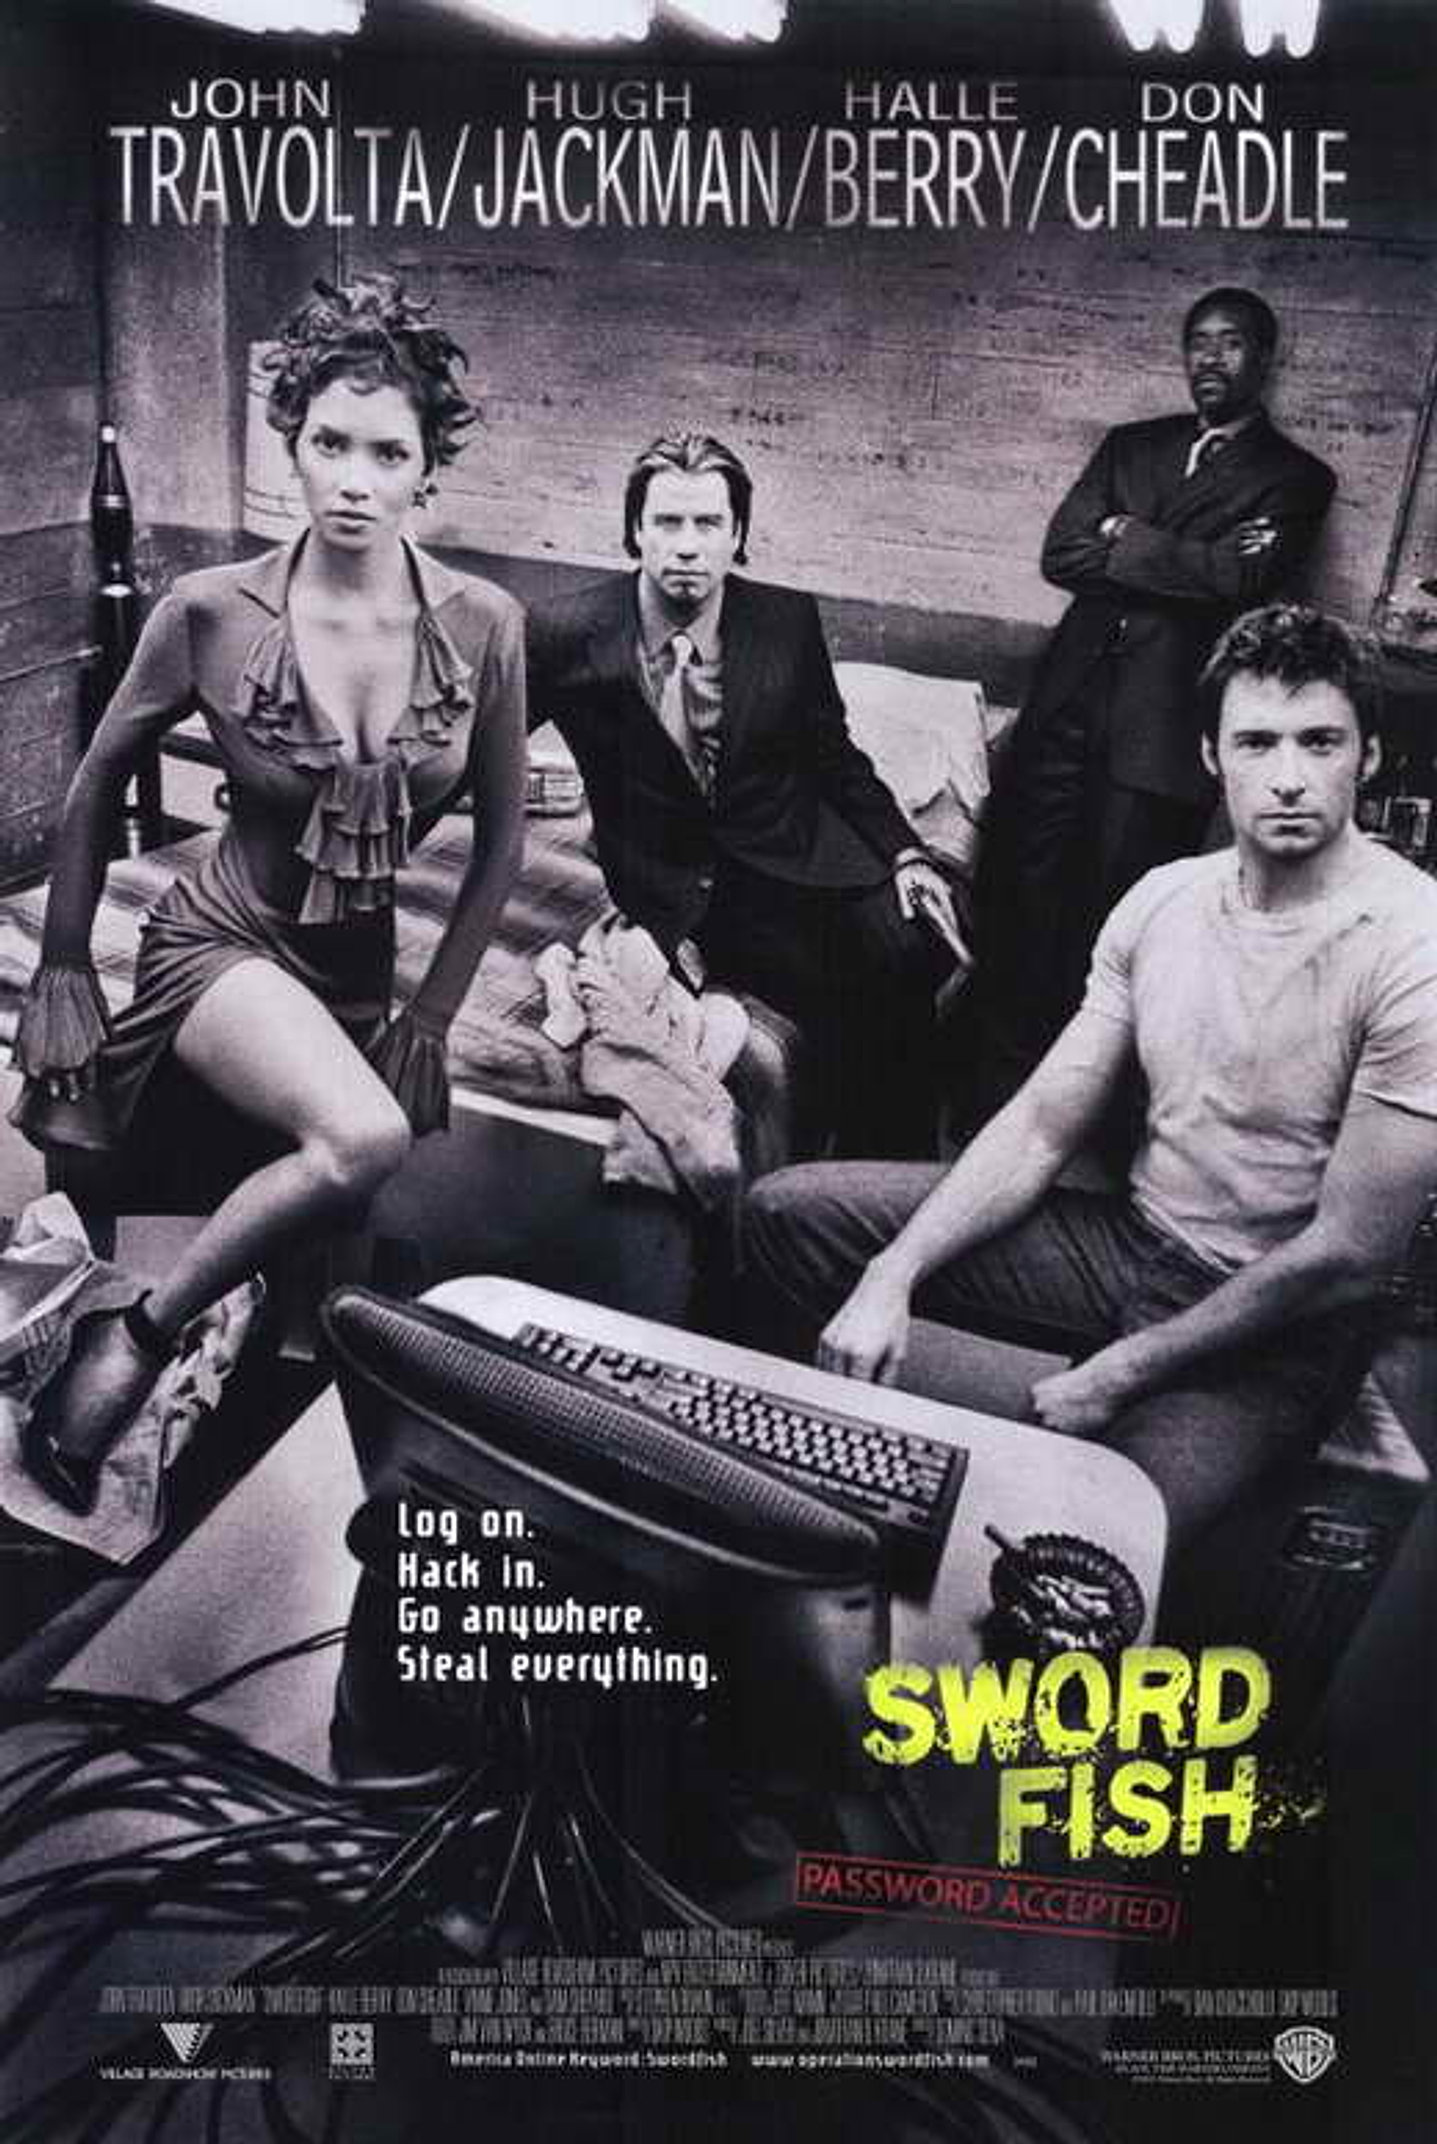 swordfish-movie-poster-2001-1020204974